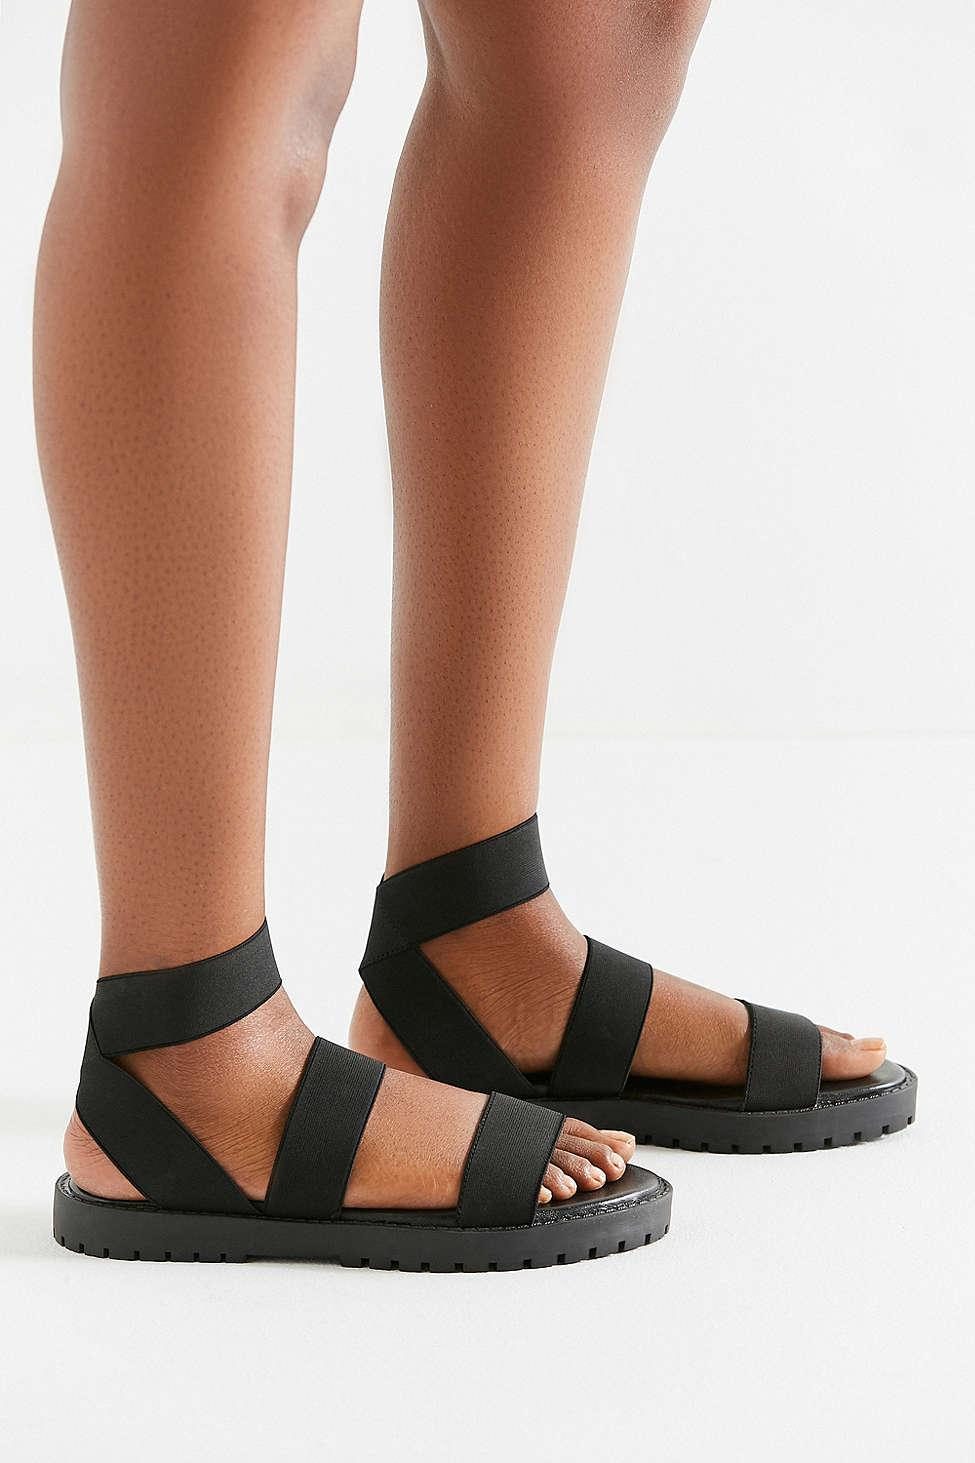 a6e85c5efd4e Lyst - Urban Outfitters Dani Elastic Gladiator Sandal in Black